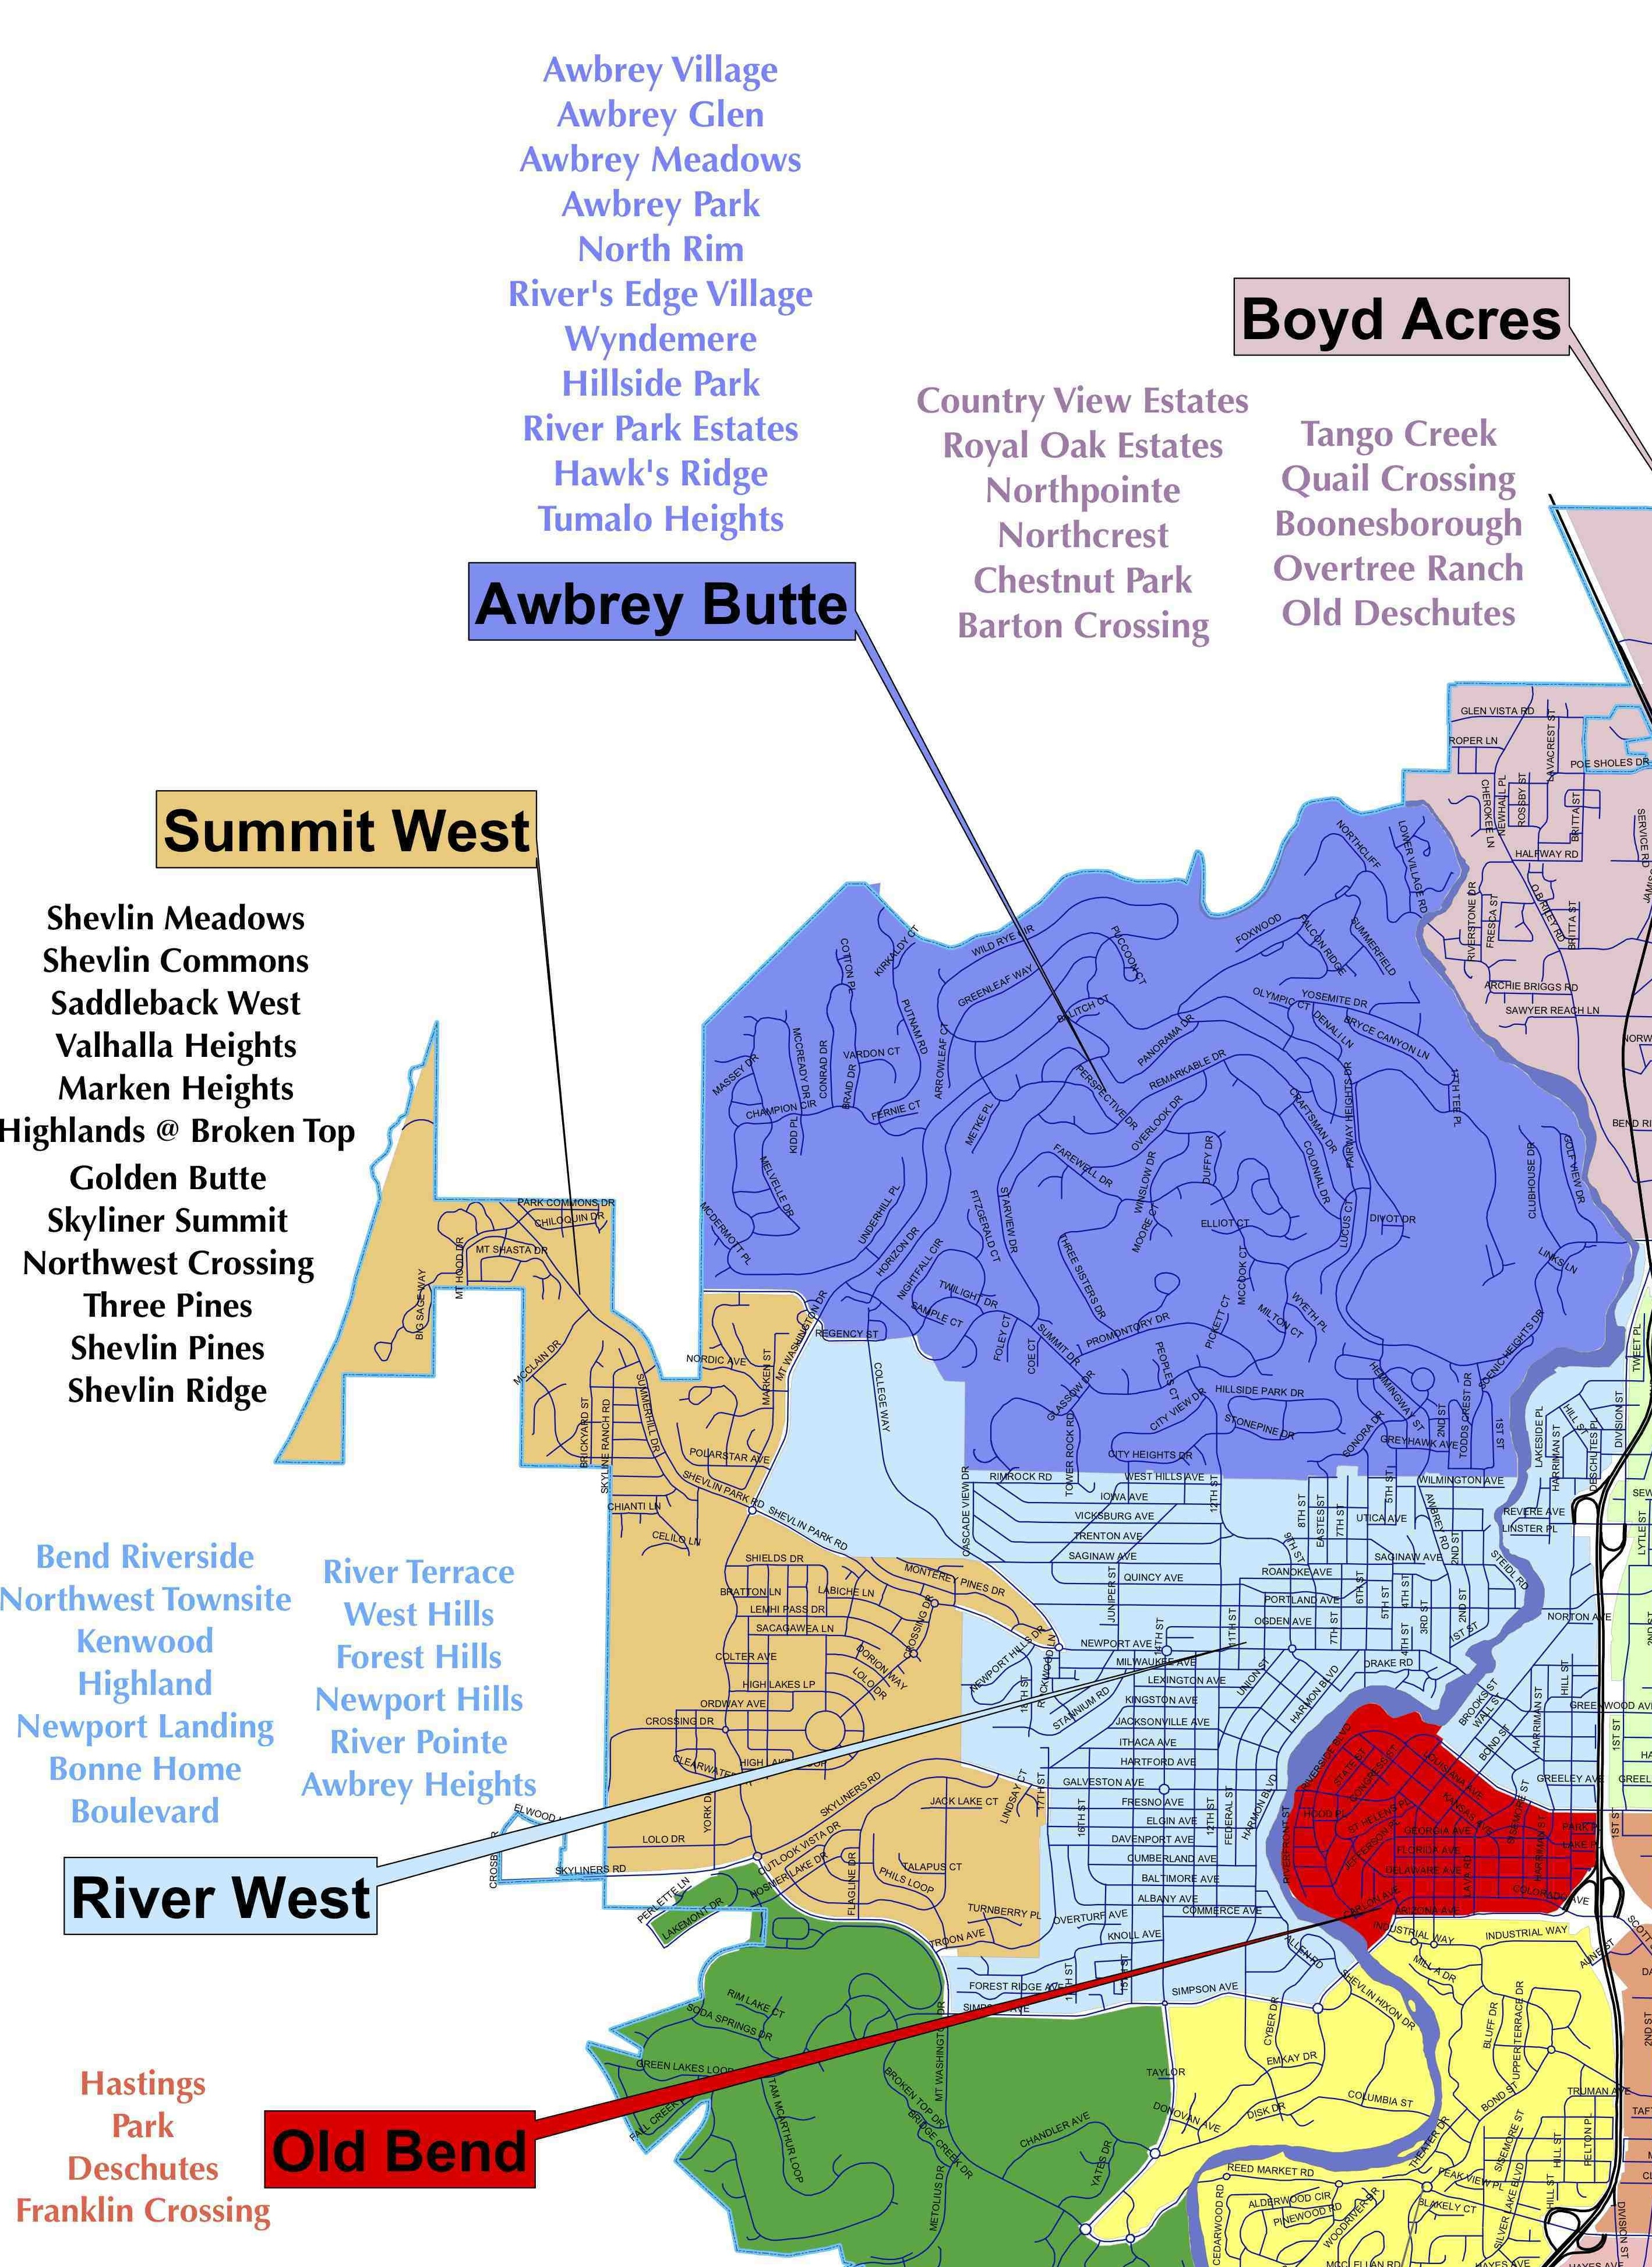 Best Neighborhoods In Bend - NW Bend - Total Bend Real Estate on